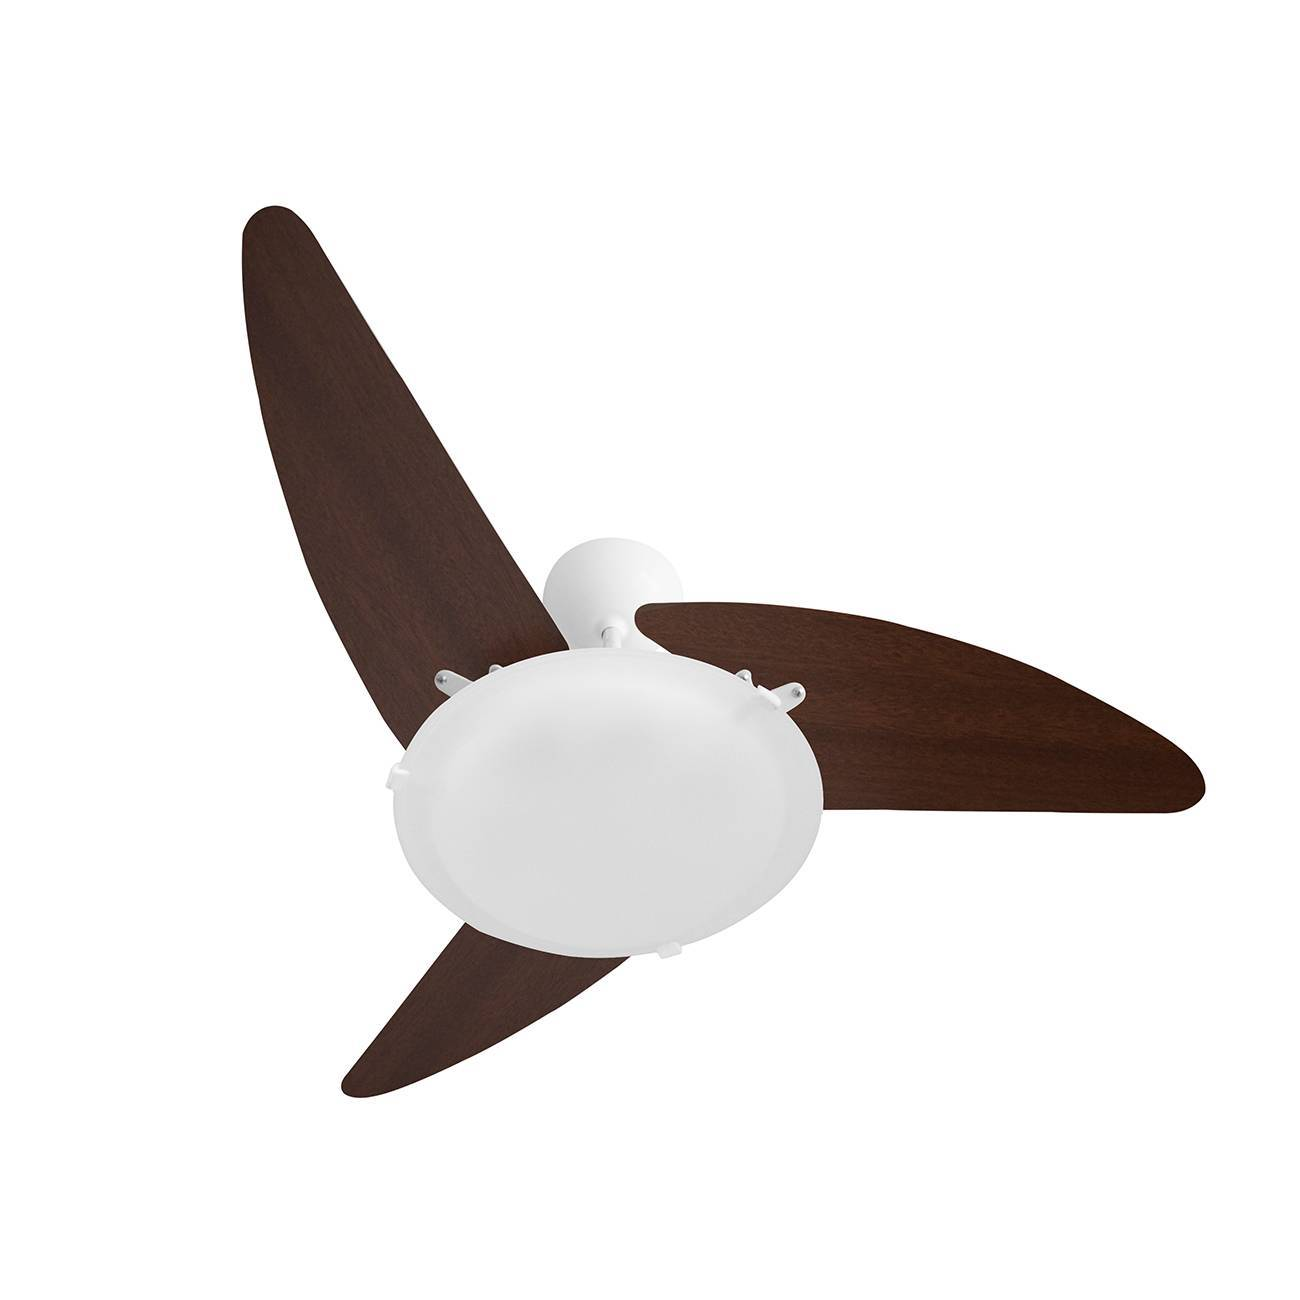 Ventilador De Teto Wind Light Branco/Tabaco Roma Ponente 3 P - LCGELETRO